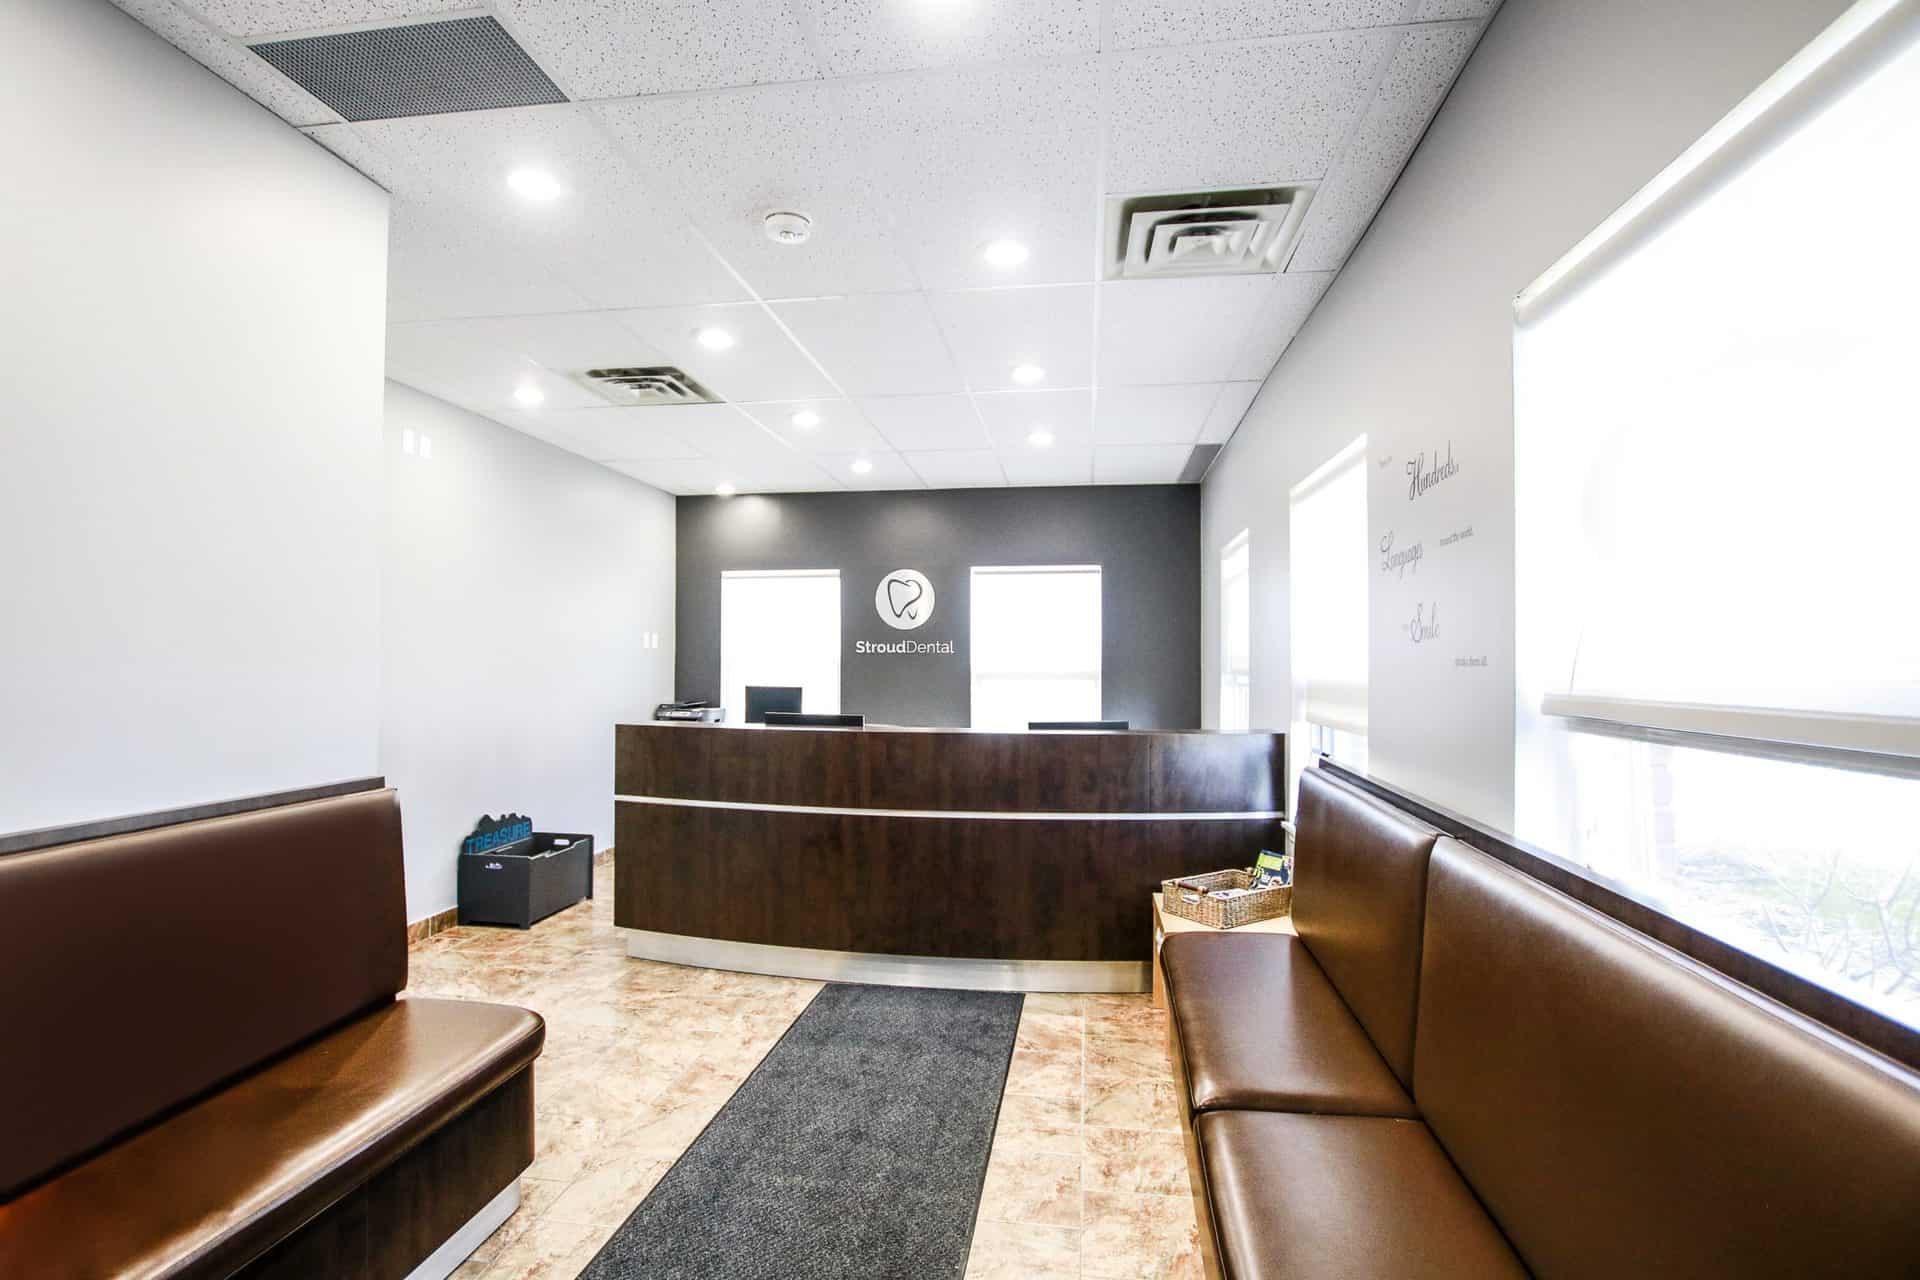 Stroud Dental clinic reception desk in Innisfil, Ontario